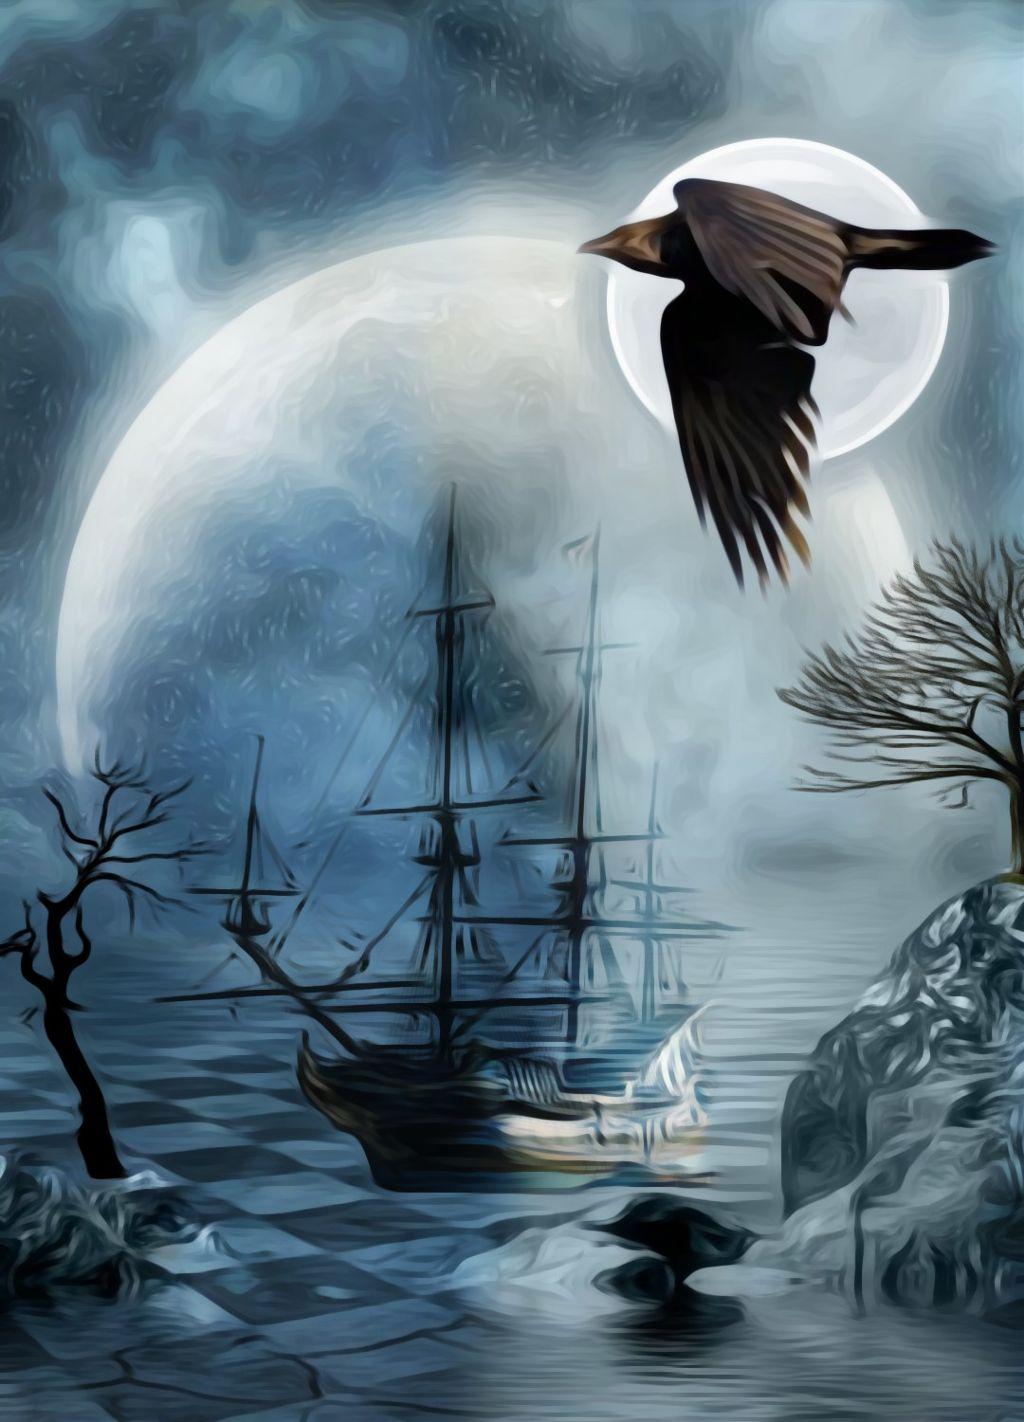 Half light half life #freetoedit #darkness #moon #pirates #ships